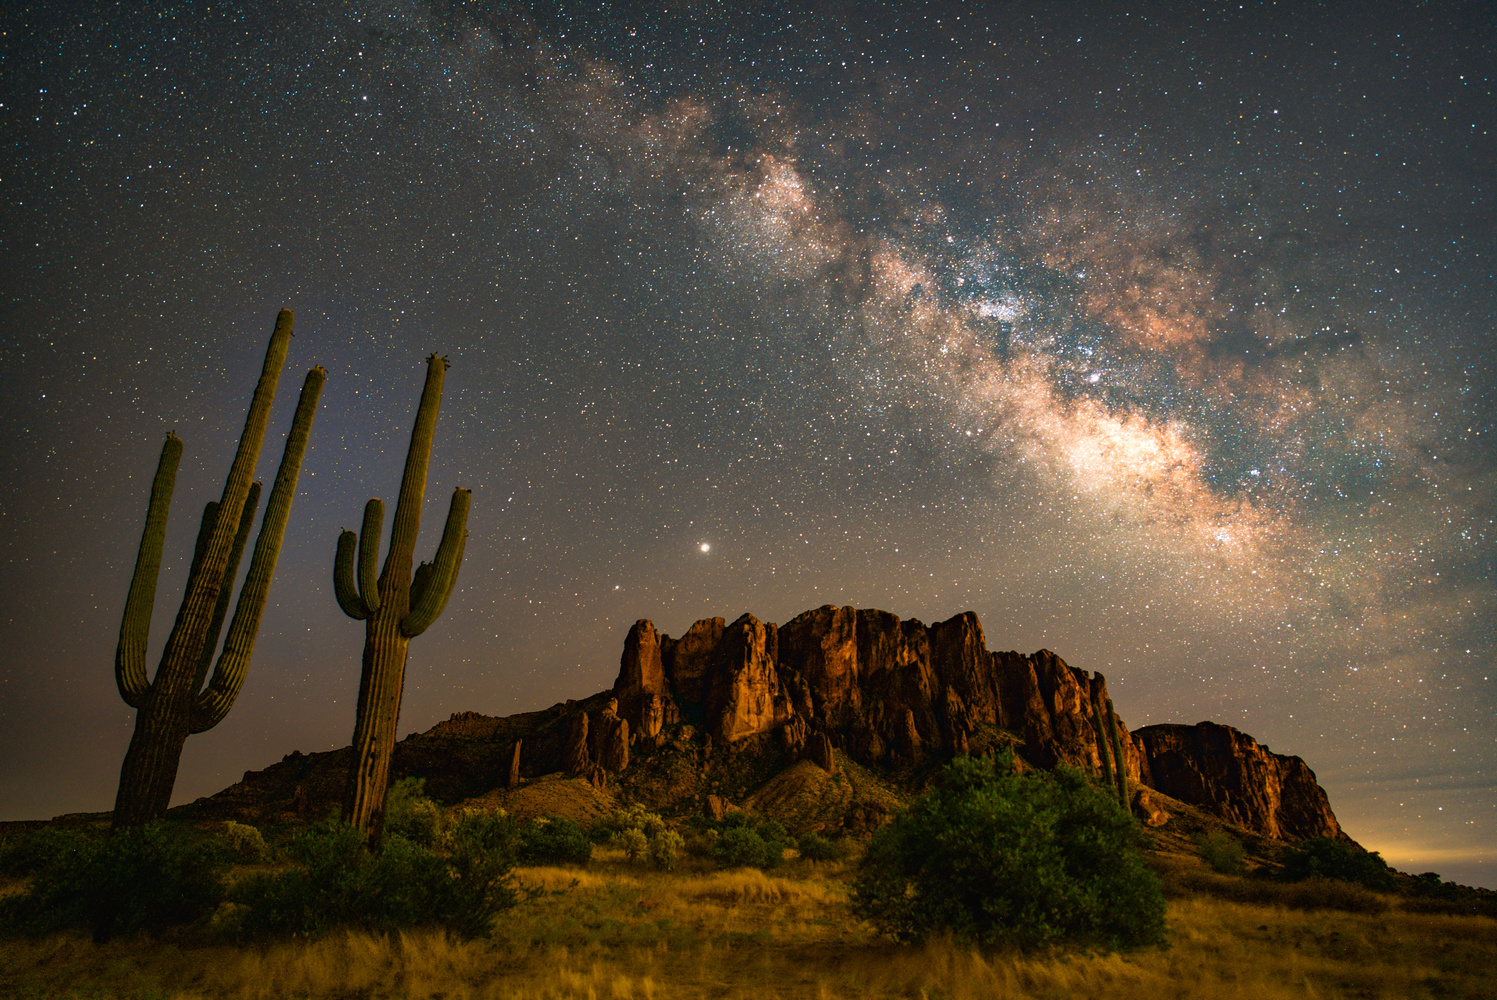 Milky Way & Jupiter Rising Over Superstition Mountain by Jeffrey Moen